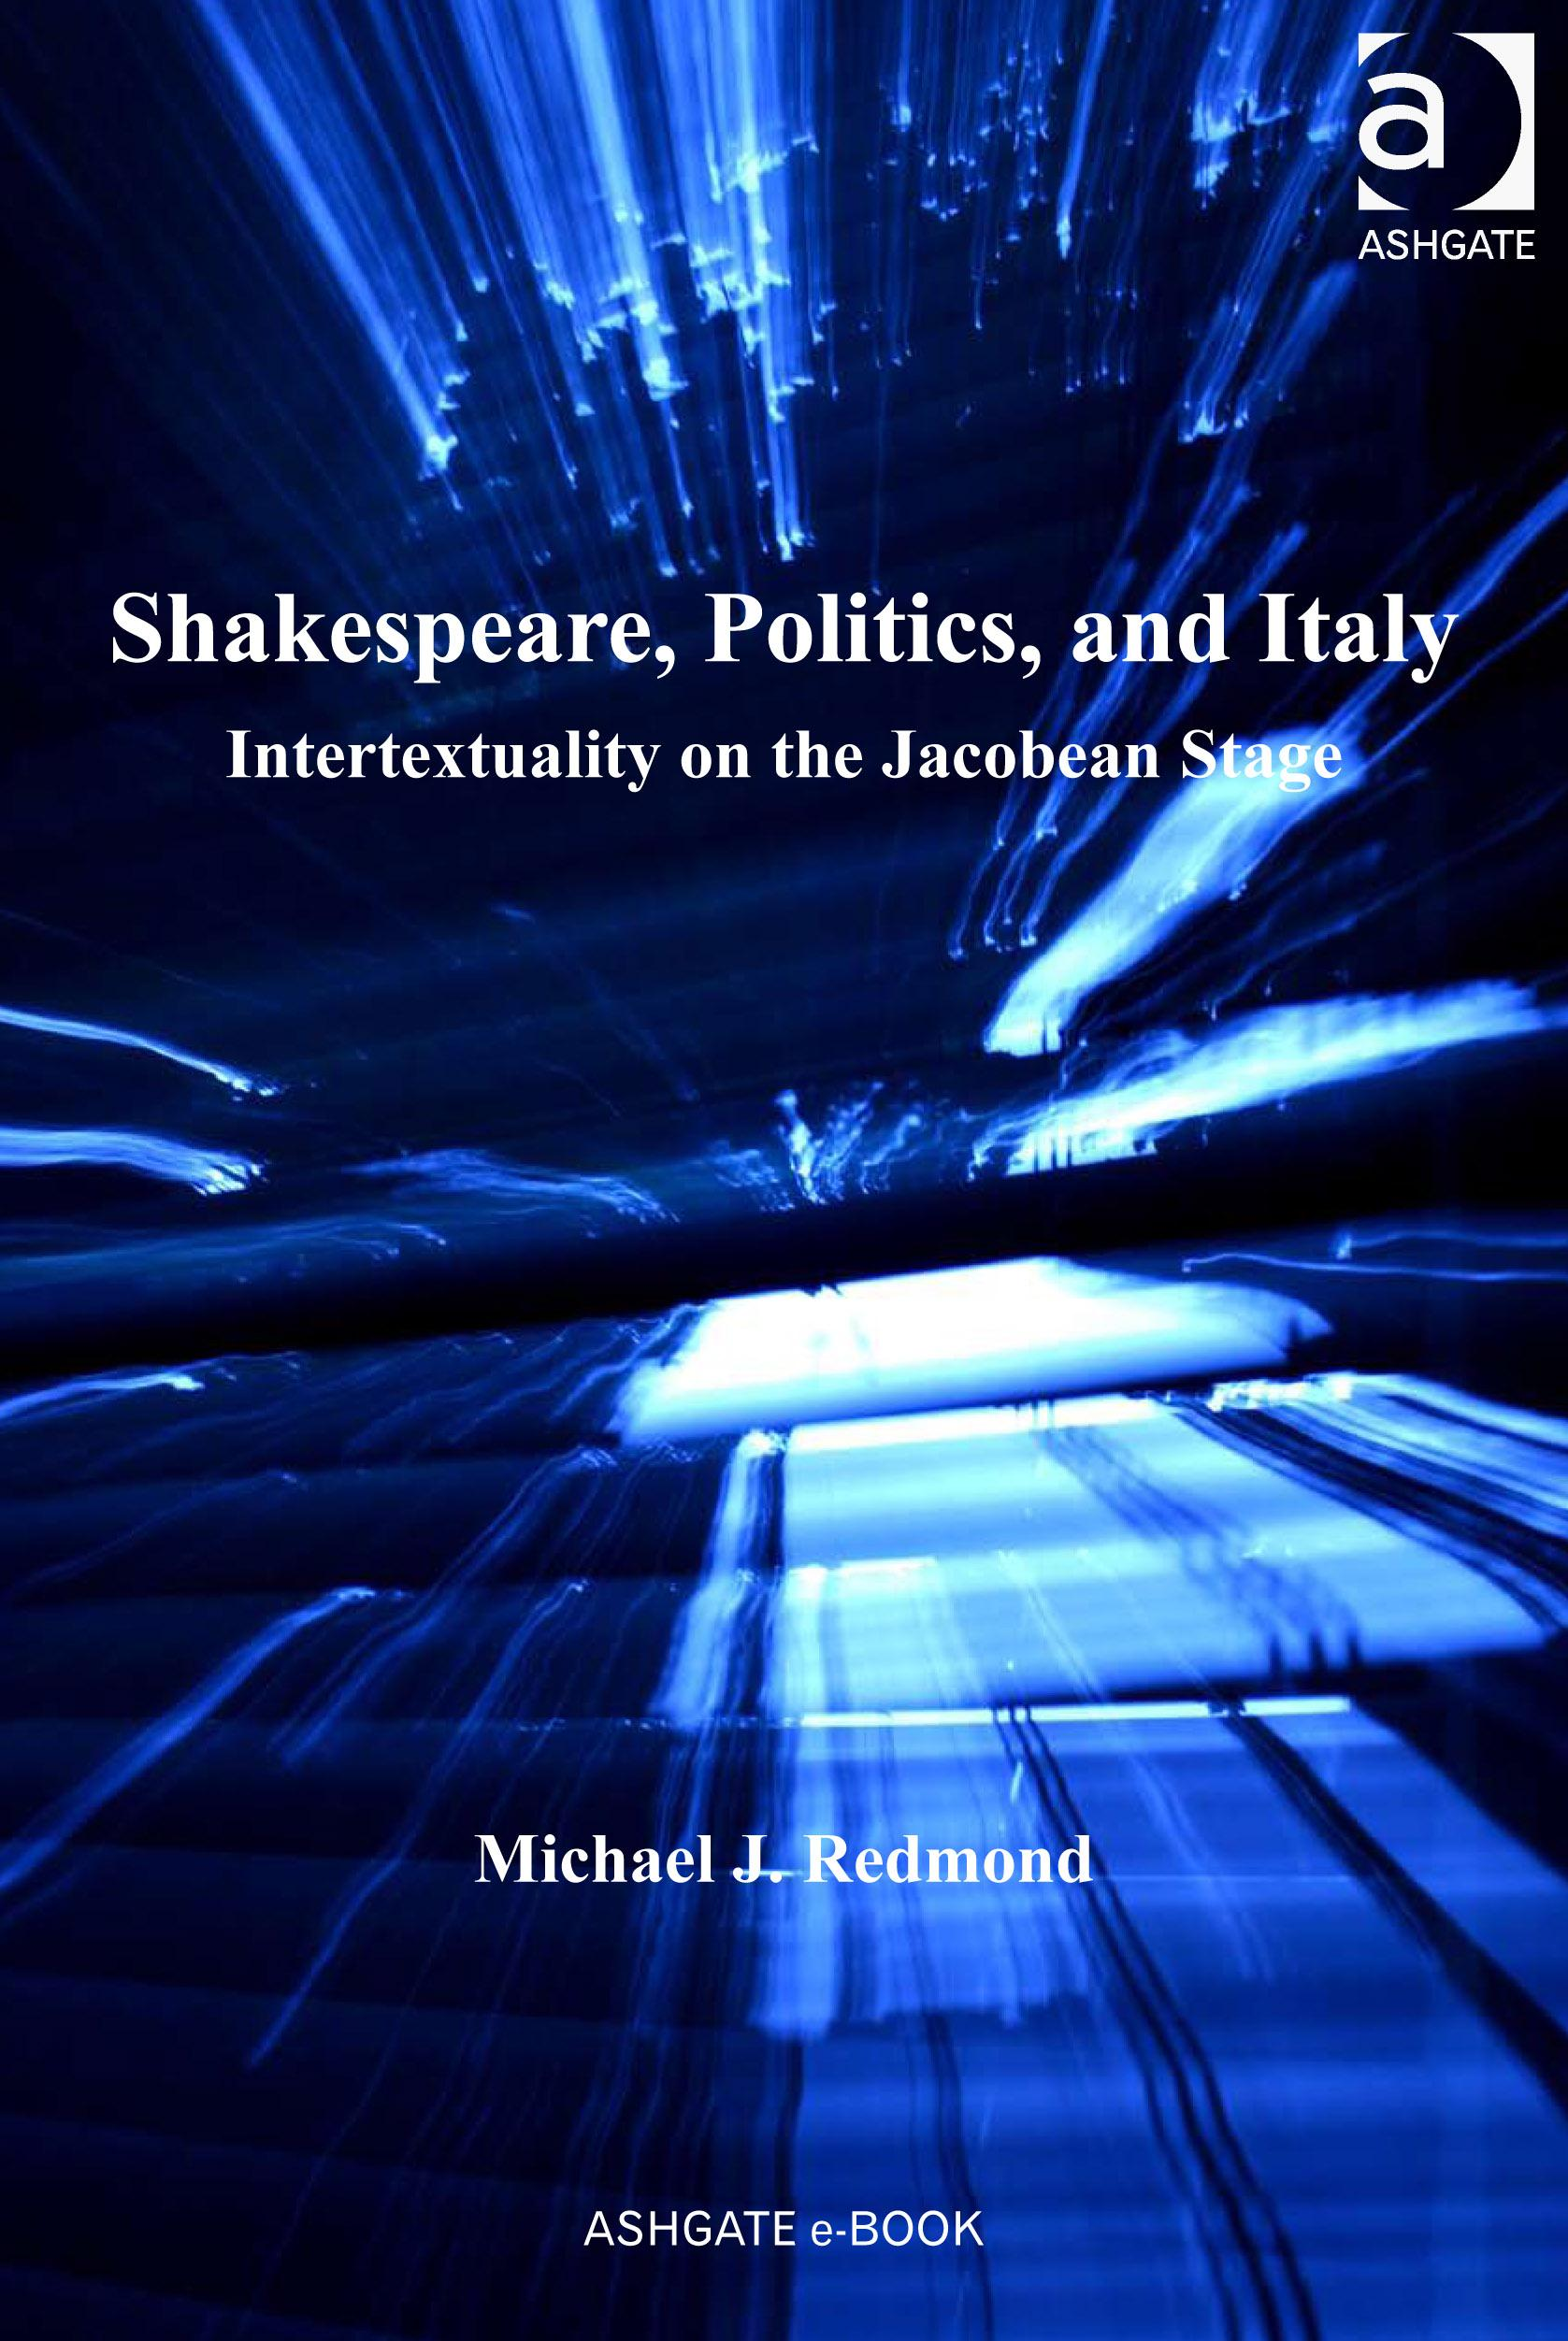 Shakespeare, Politics, and Italy: Intertextuality on the Jacobean Stage EB9780754695721